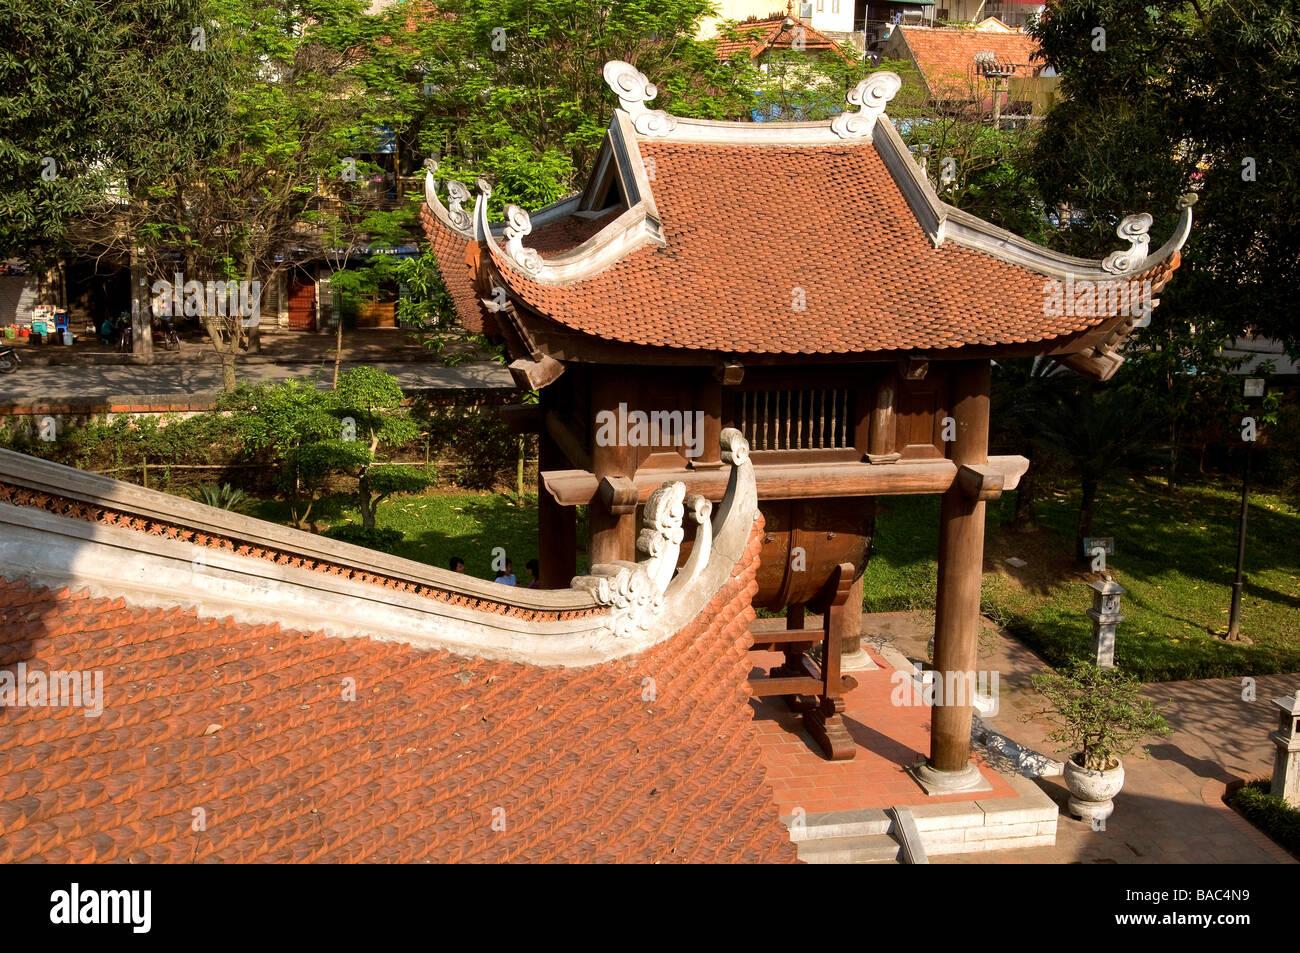 Vietnam, Hanoi, the Temple of Literature XI century - Stock Image